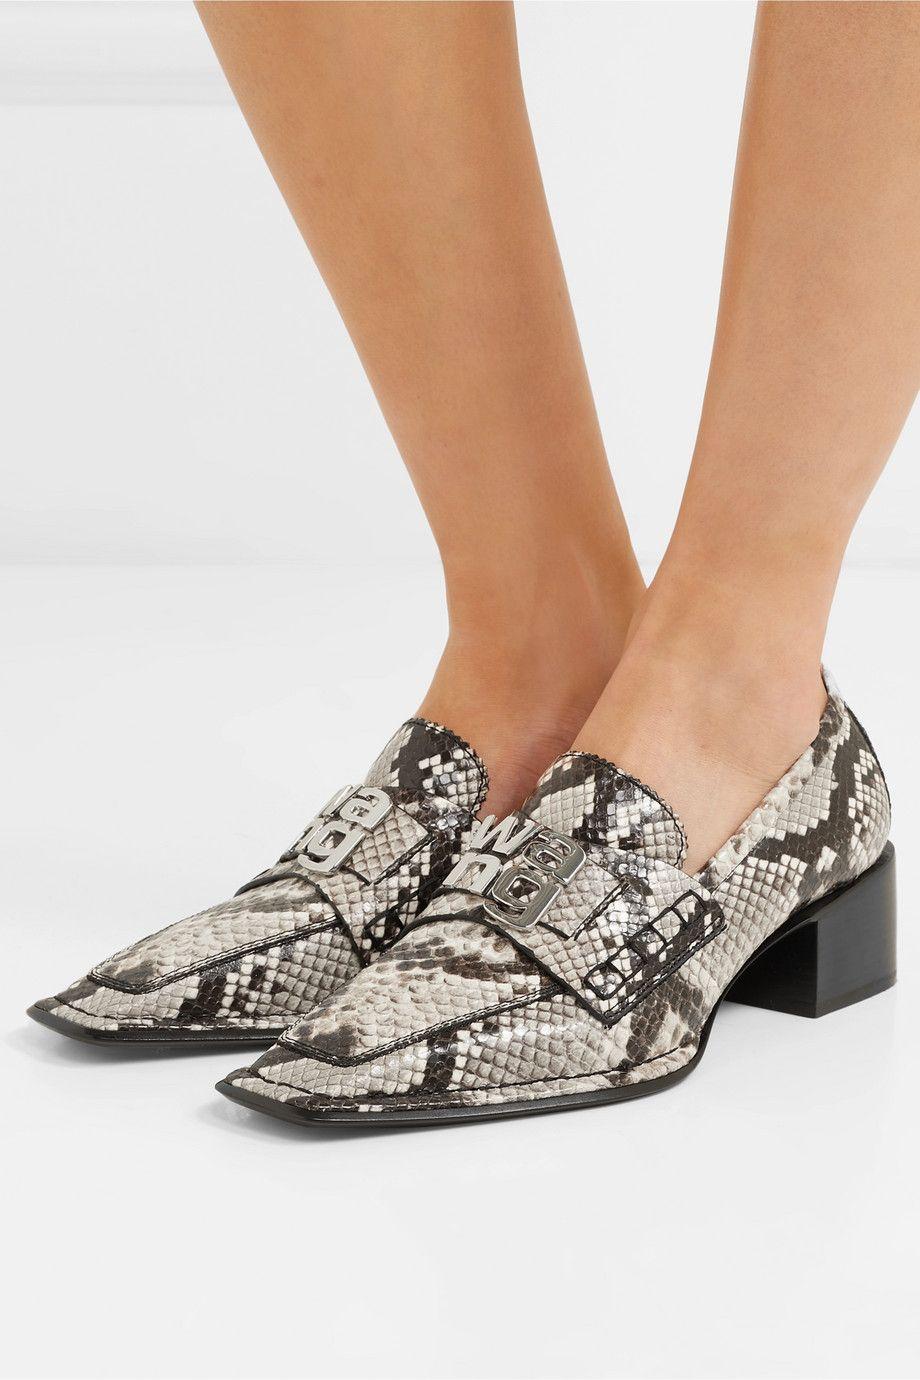 Snake Print Parker Embellished Snake Effect Leather Pumps Alexander Wang Leather Pumps Trending Shoes Women Shoes